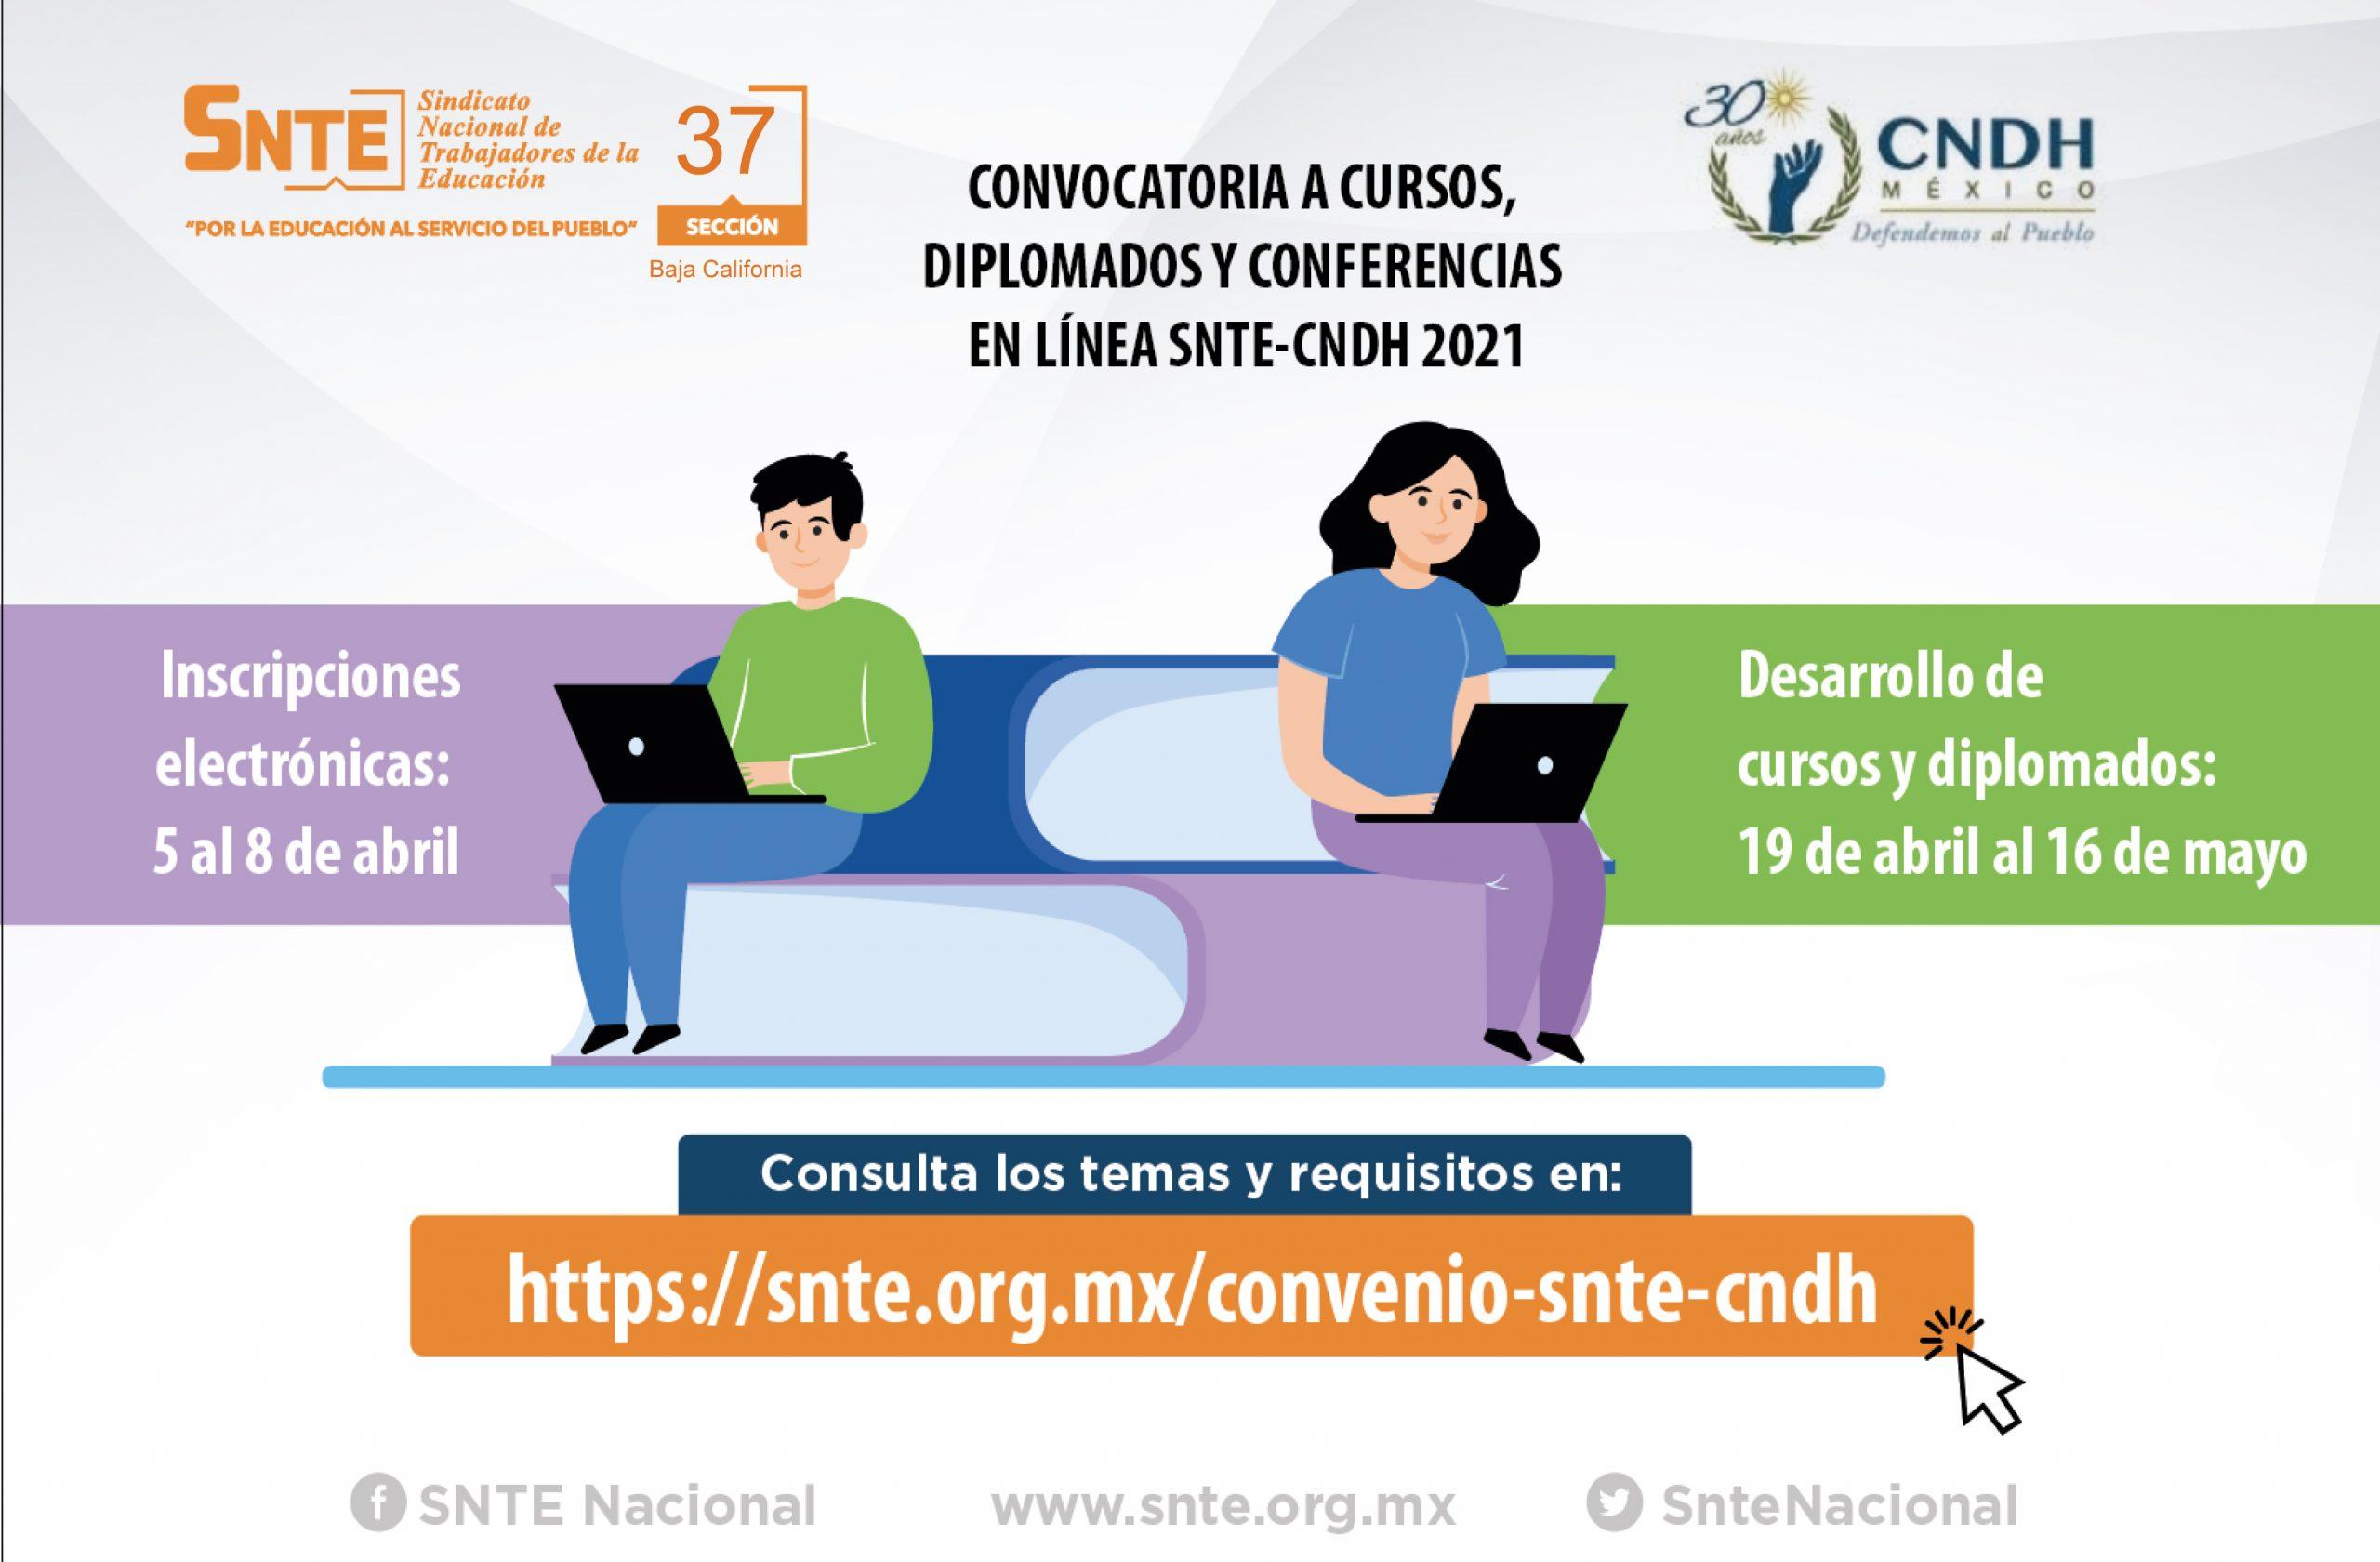 Convocatoria a cursos, diplomados y en linea SNTE-CNDH 2021, Segundo Periodo